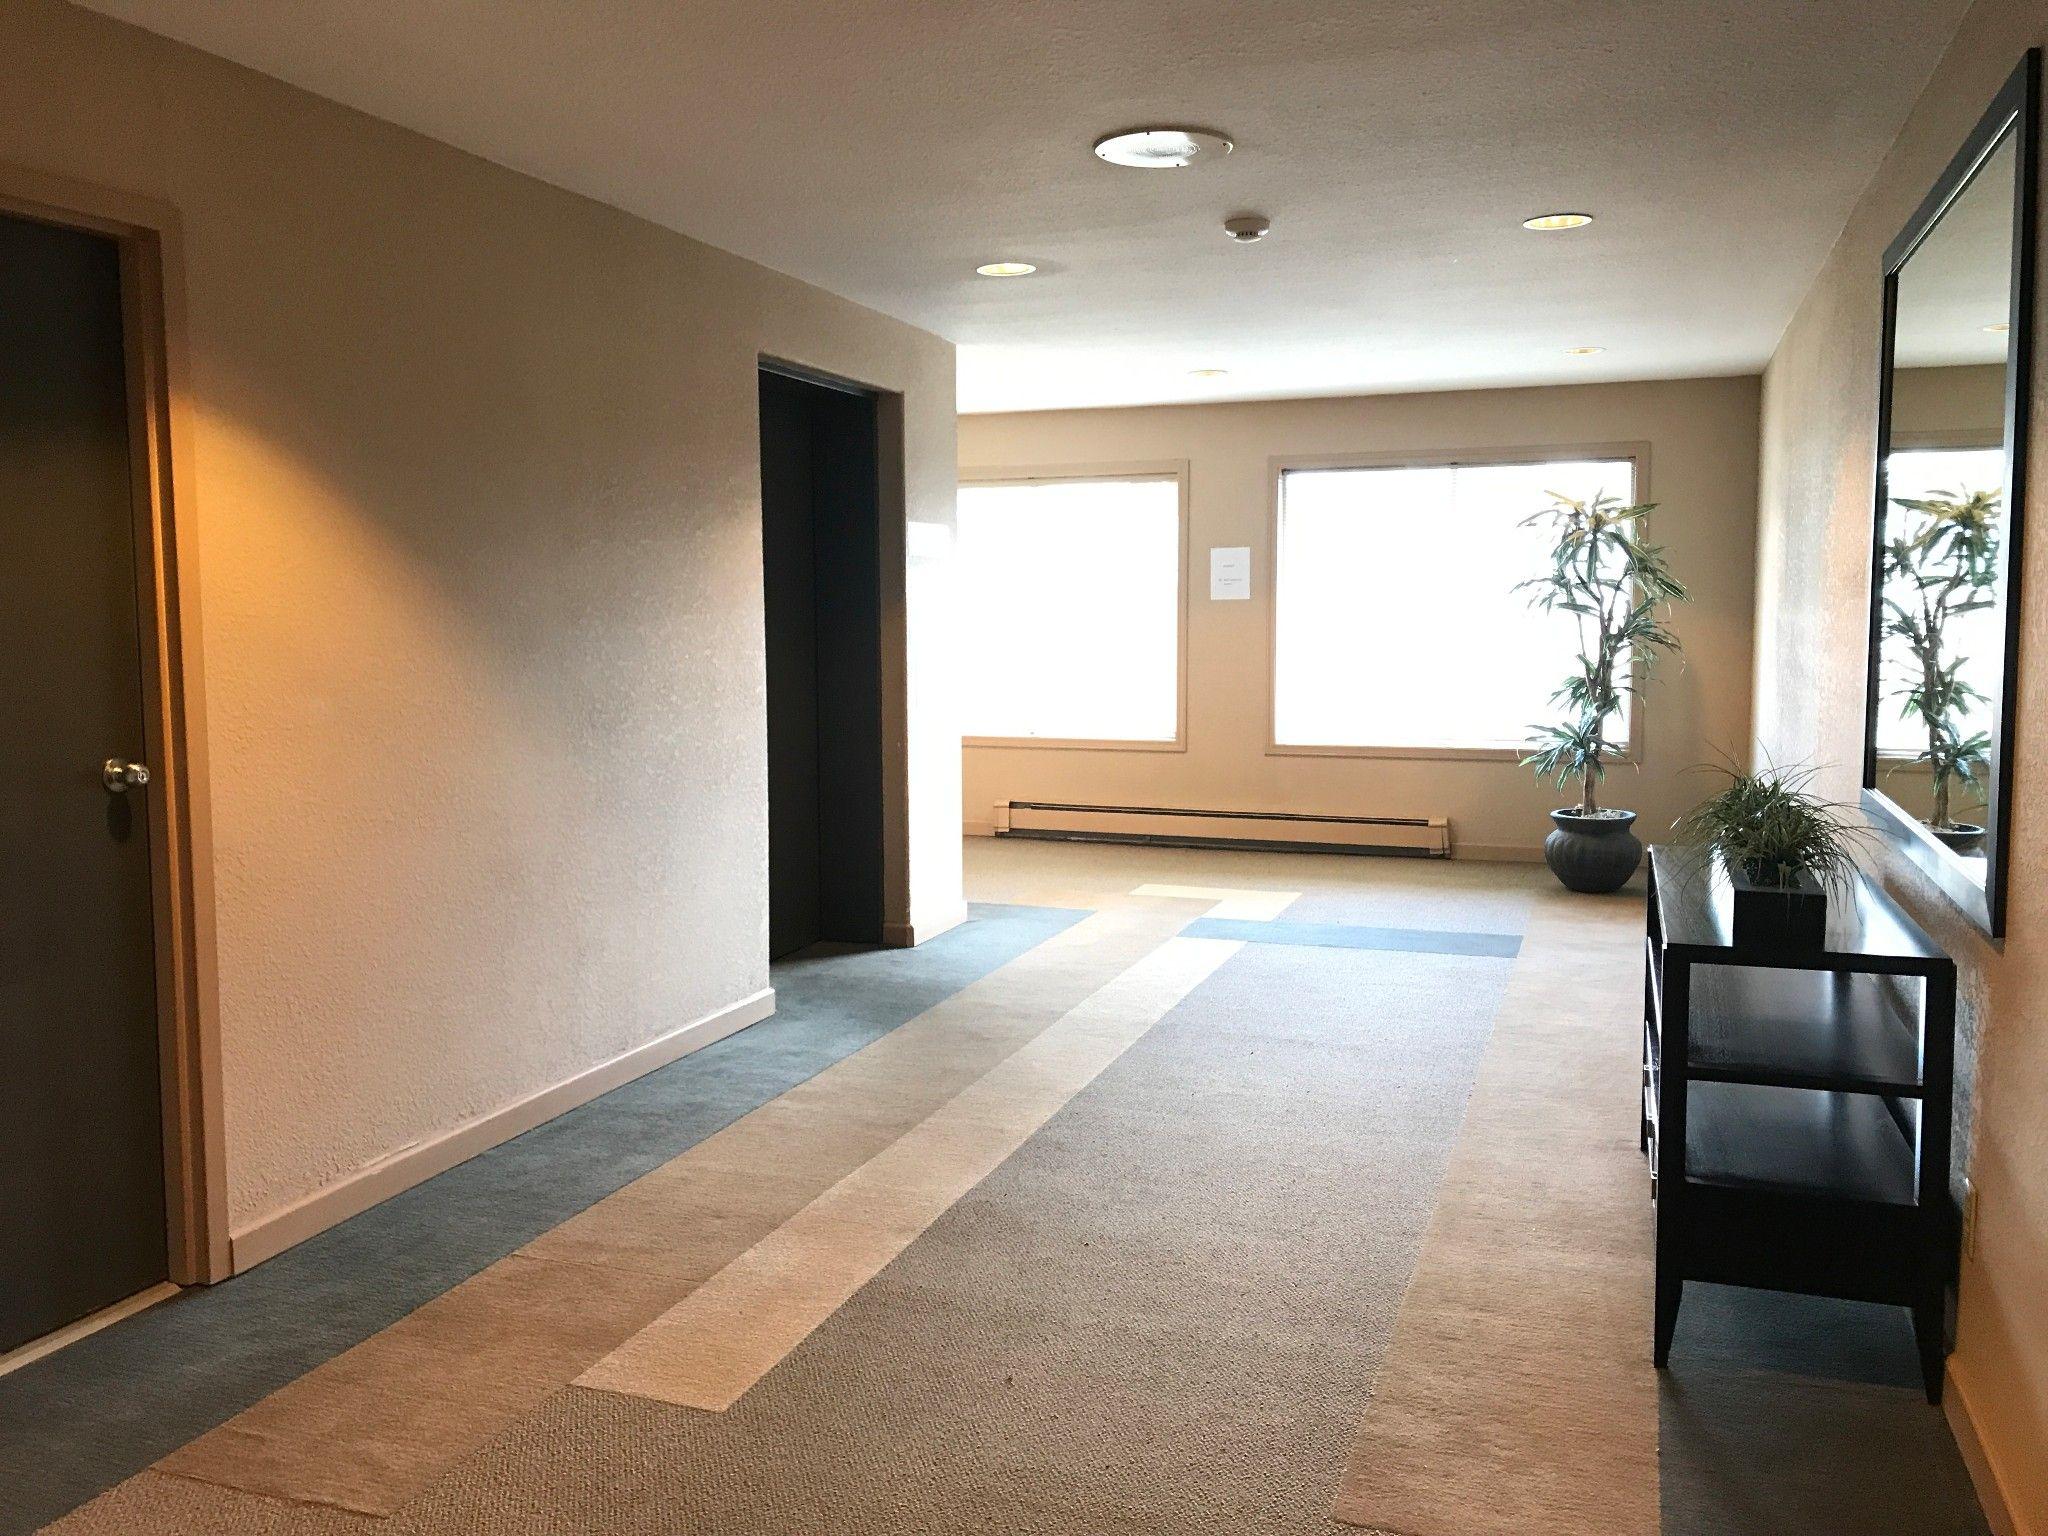 Photo 15: Photos: #329 2700 McCallum Rd. in Abbotsford: Central Abbotsford Condo for rent